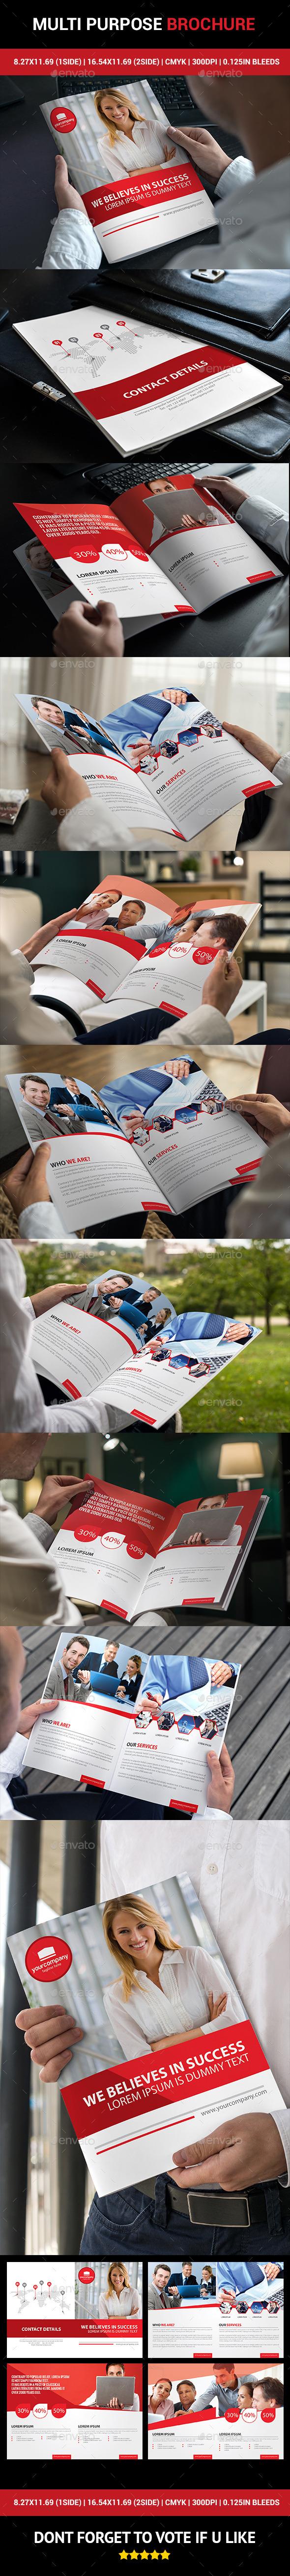 Multi Purpose Corporate Brochure - Informational Brochures